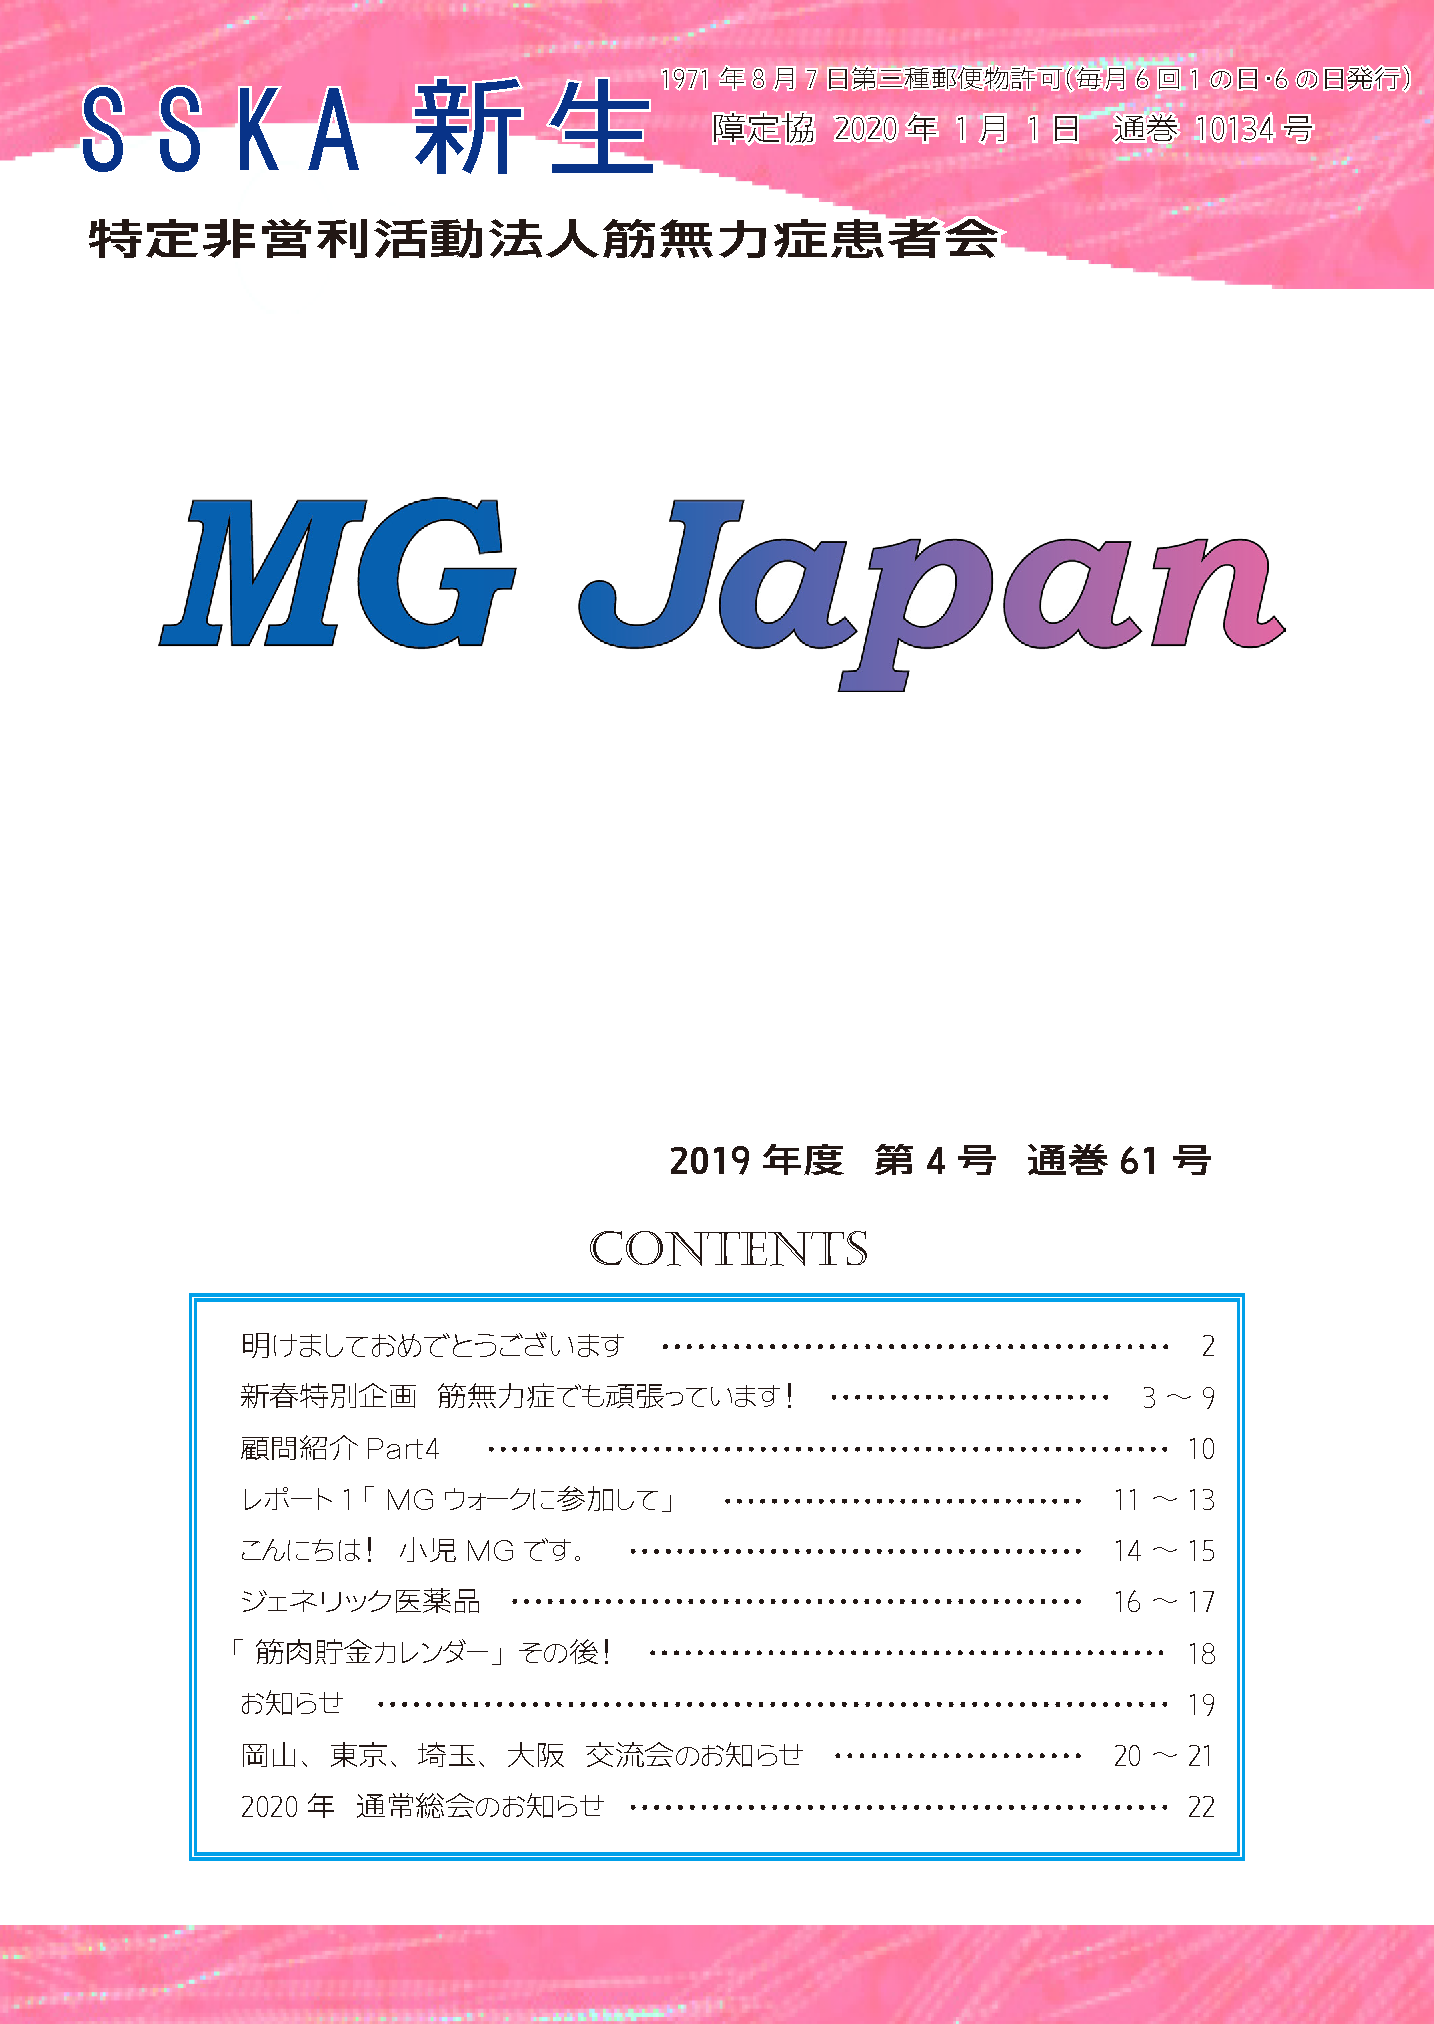 会報新生「MG Japan」